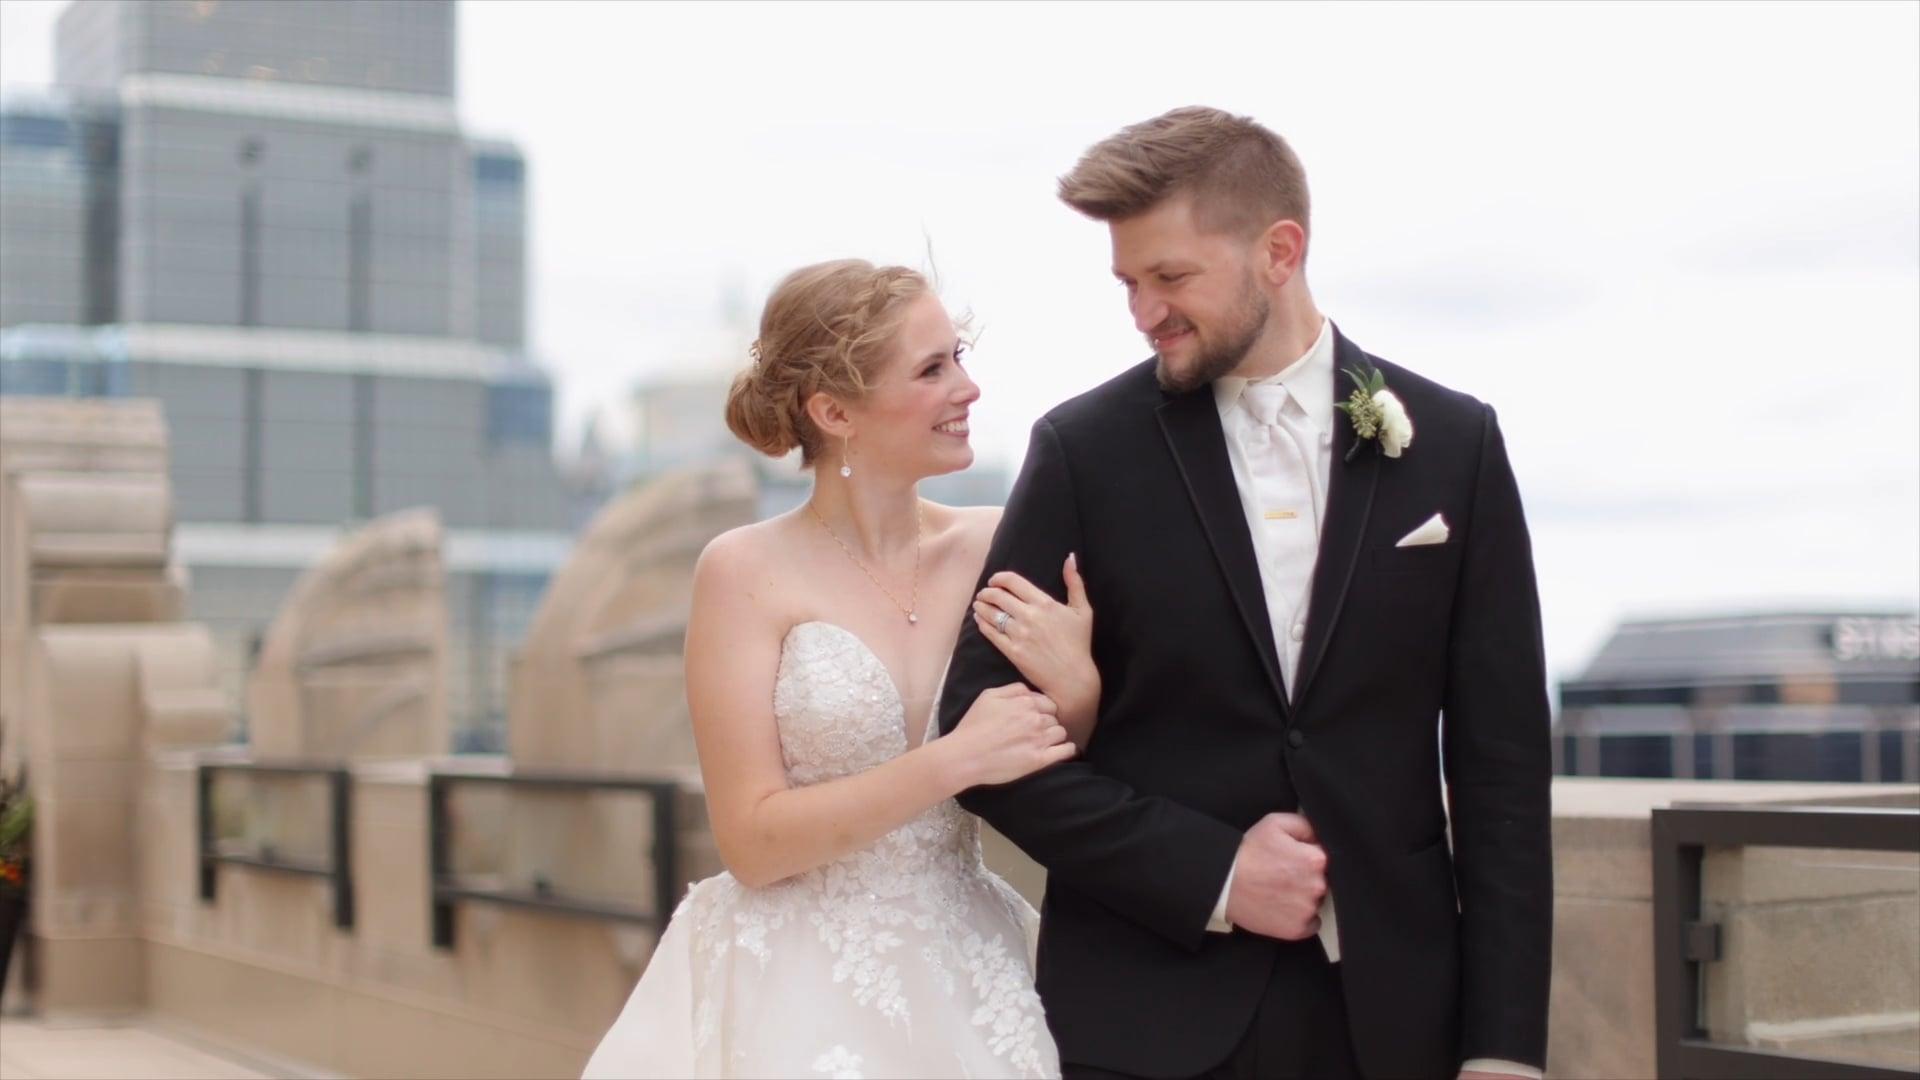 Dominique & Jarrod // Baysinger Films Wedding Videography // The Grand Hall Kansas City, MO